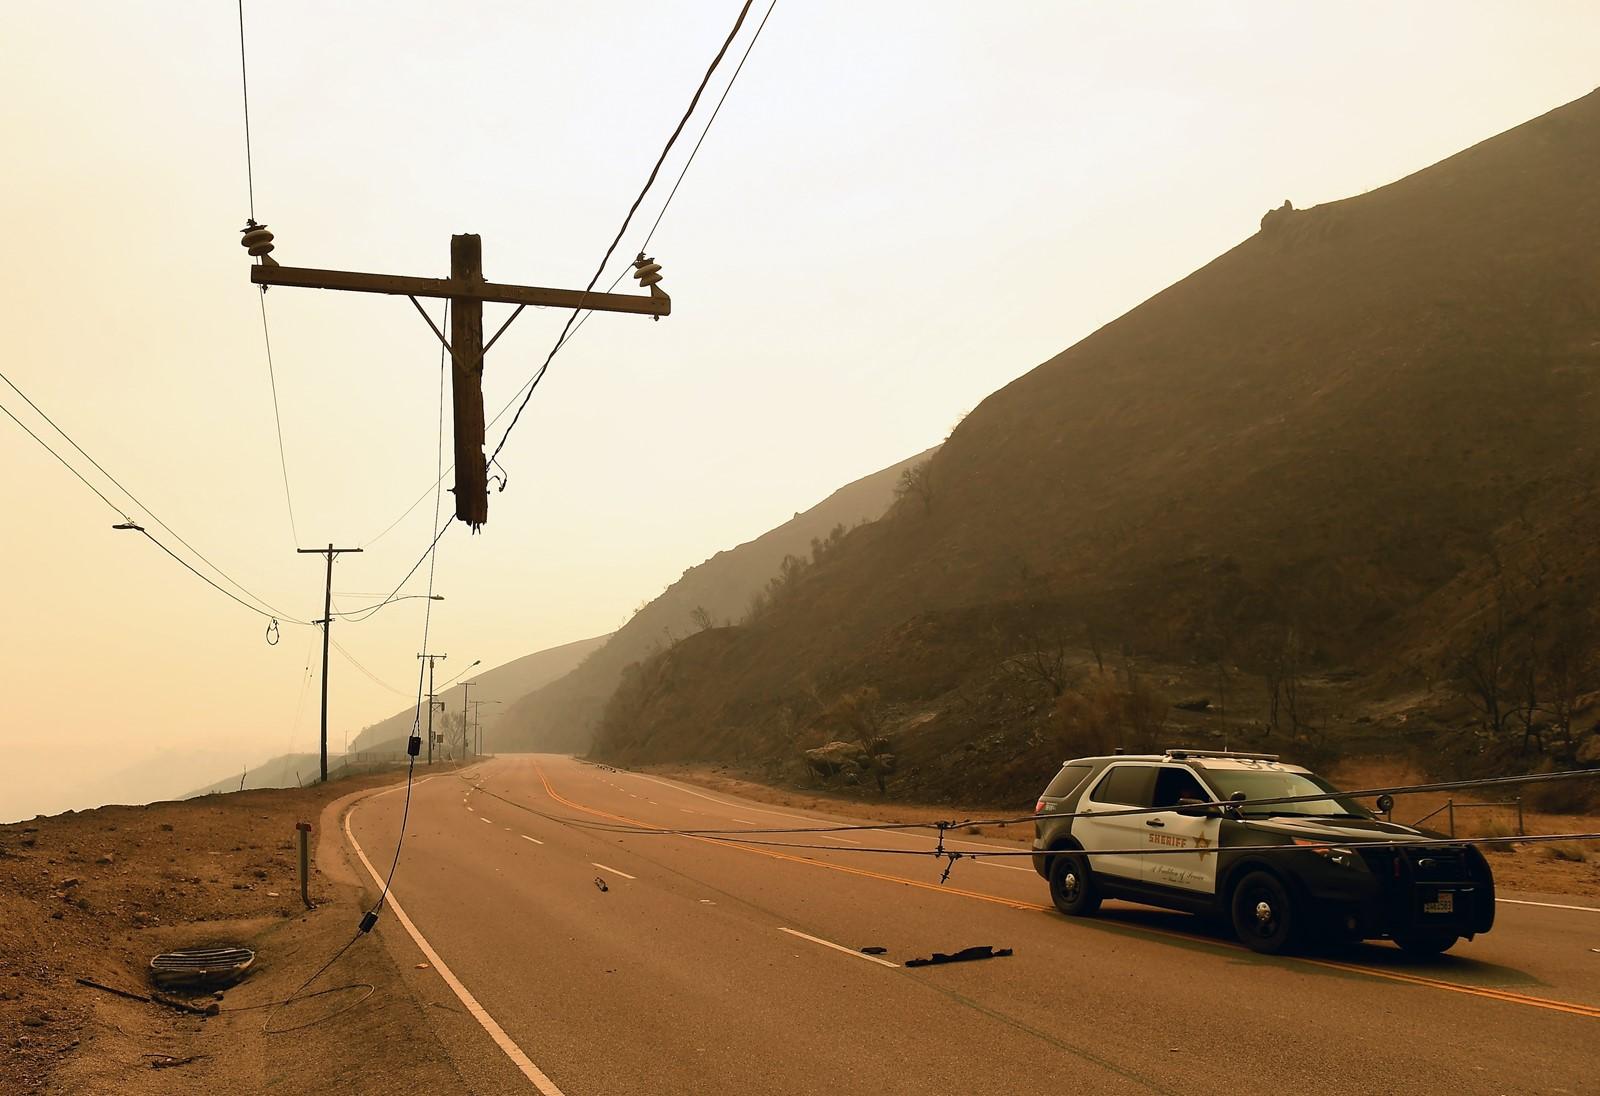 Print Edison, PG&E plunge as fires rage Investors hammer the